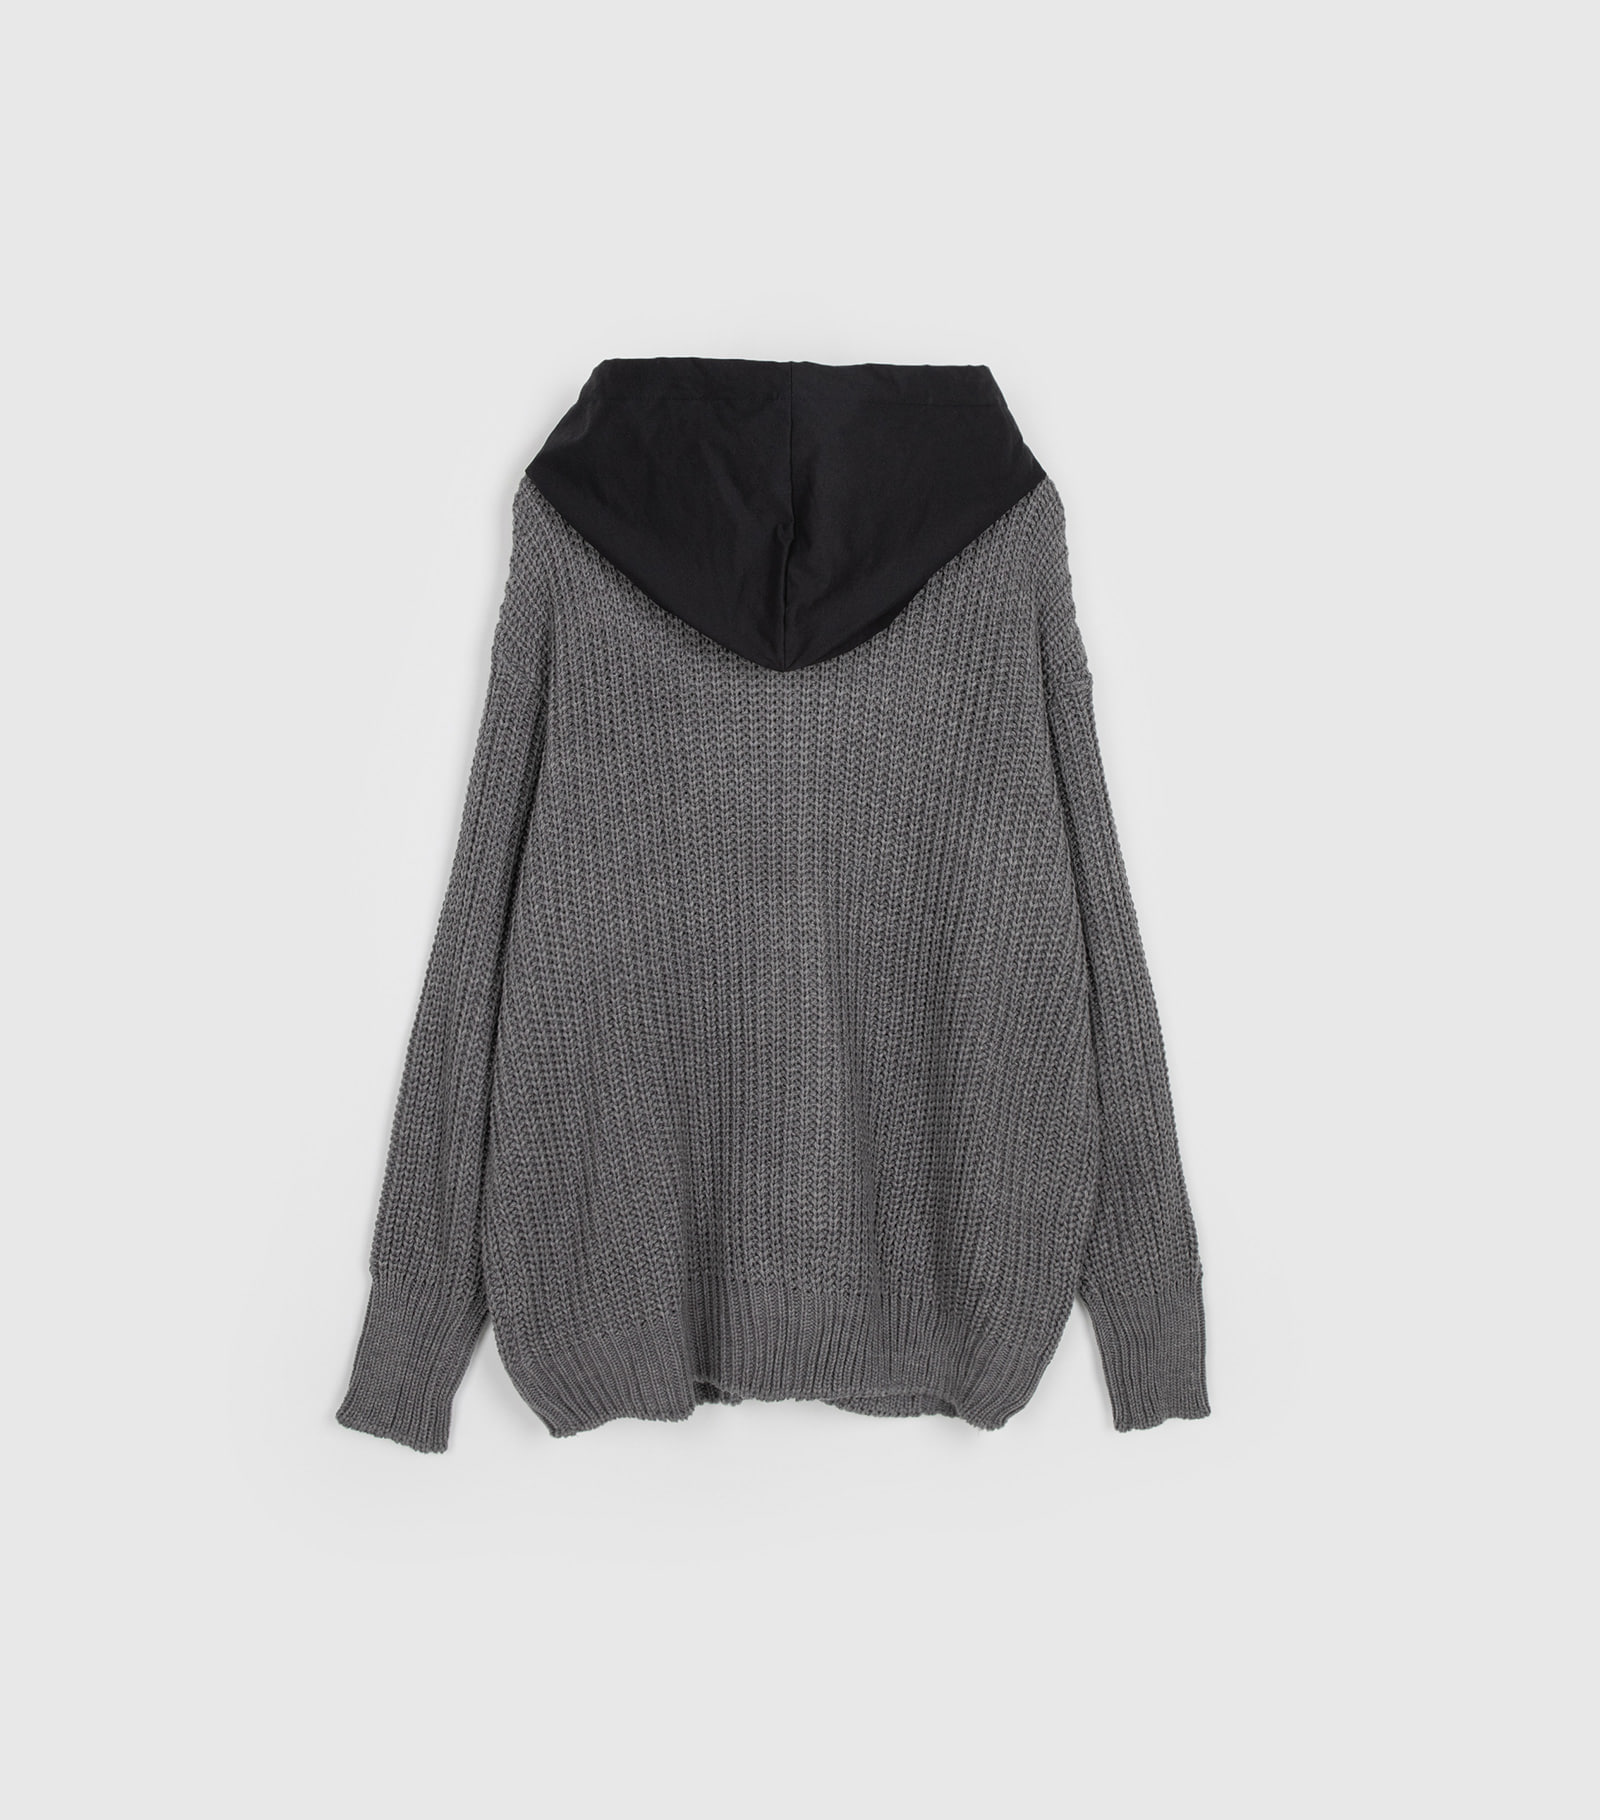 Muse-knit hooded zip-up sweatshirt